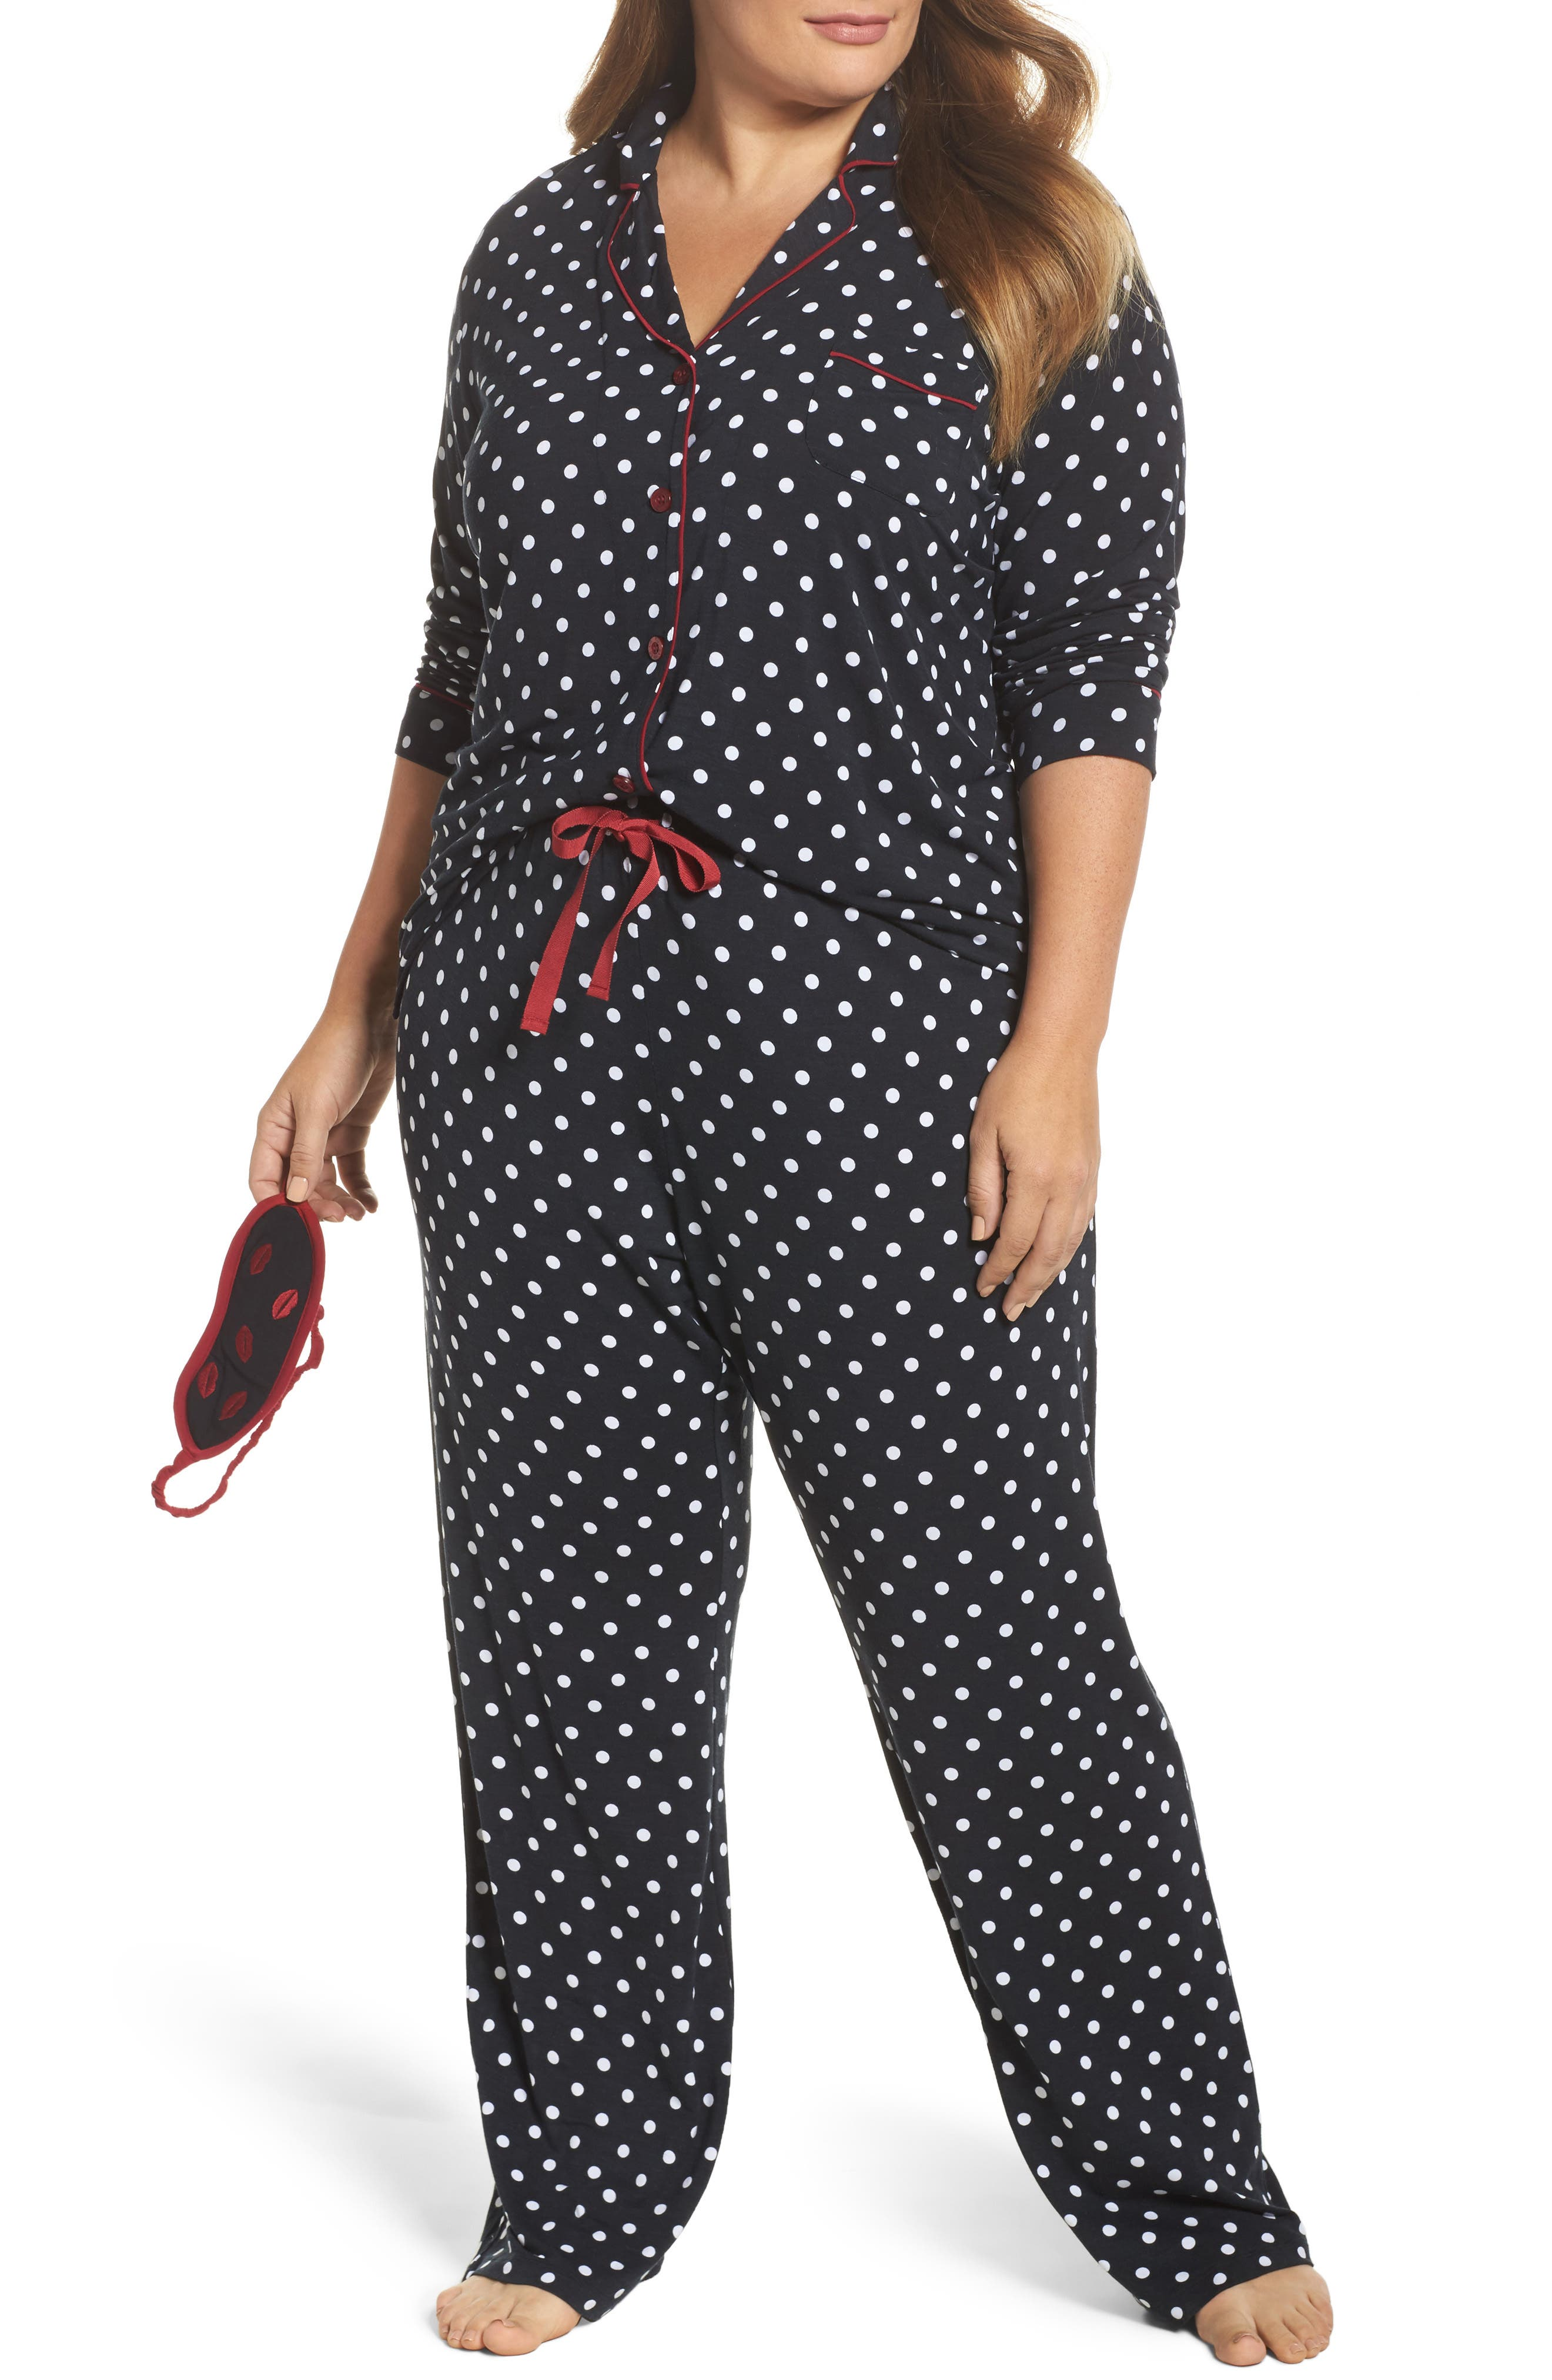 Stretch Modal Pajamas & Eye Mask,                         Main,                         color, 001